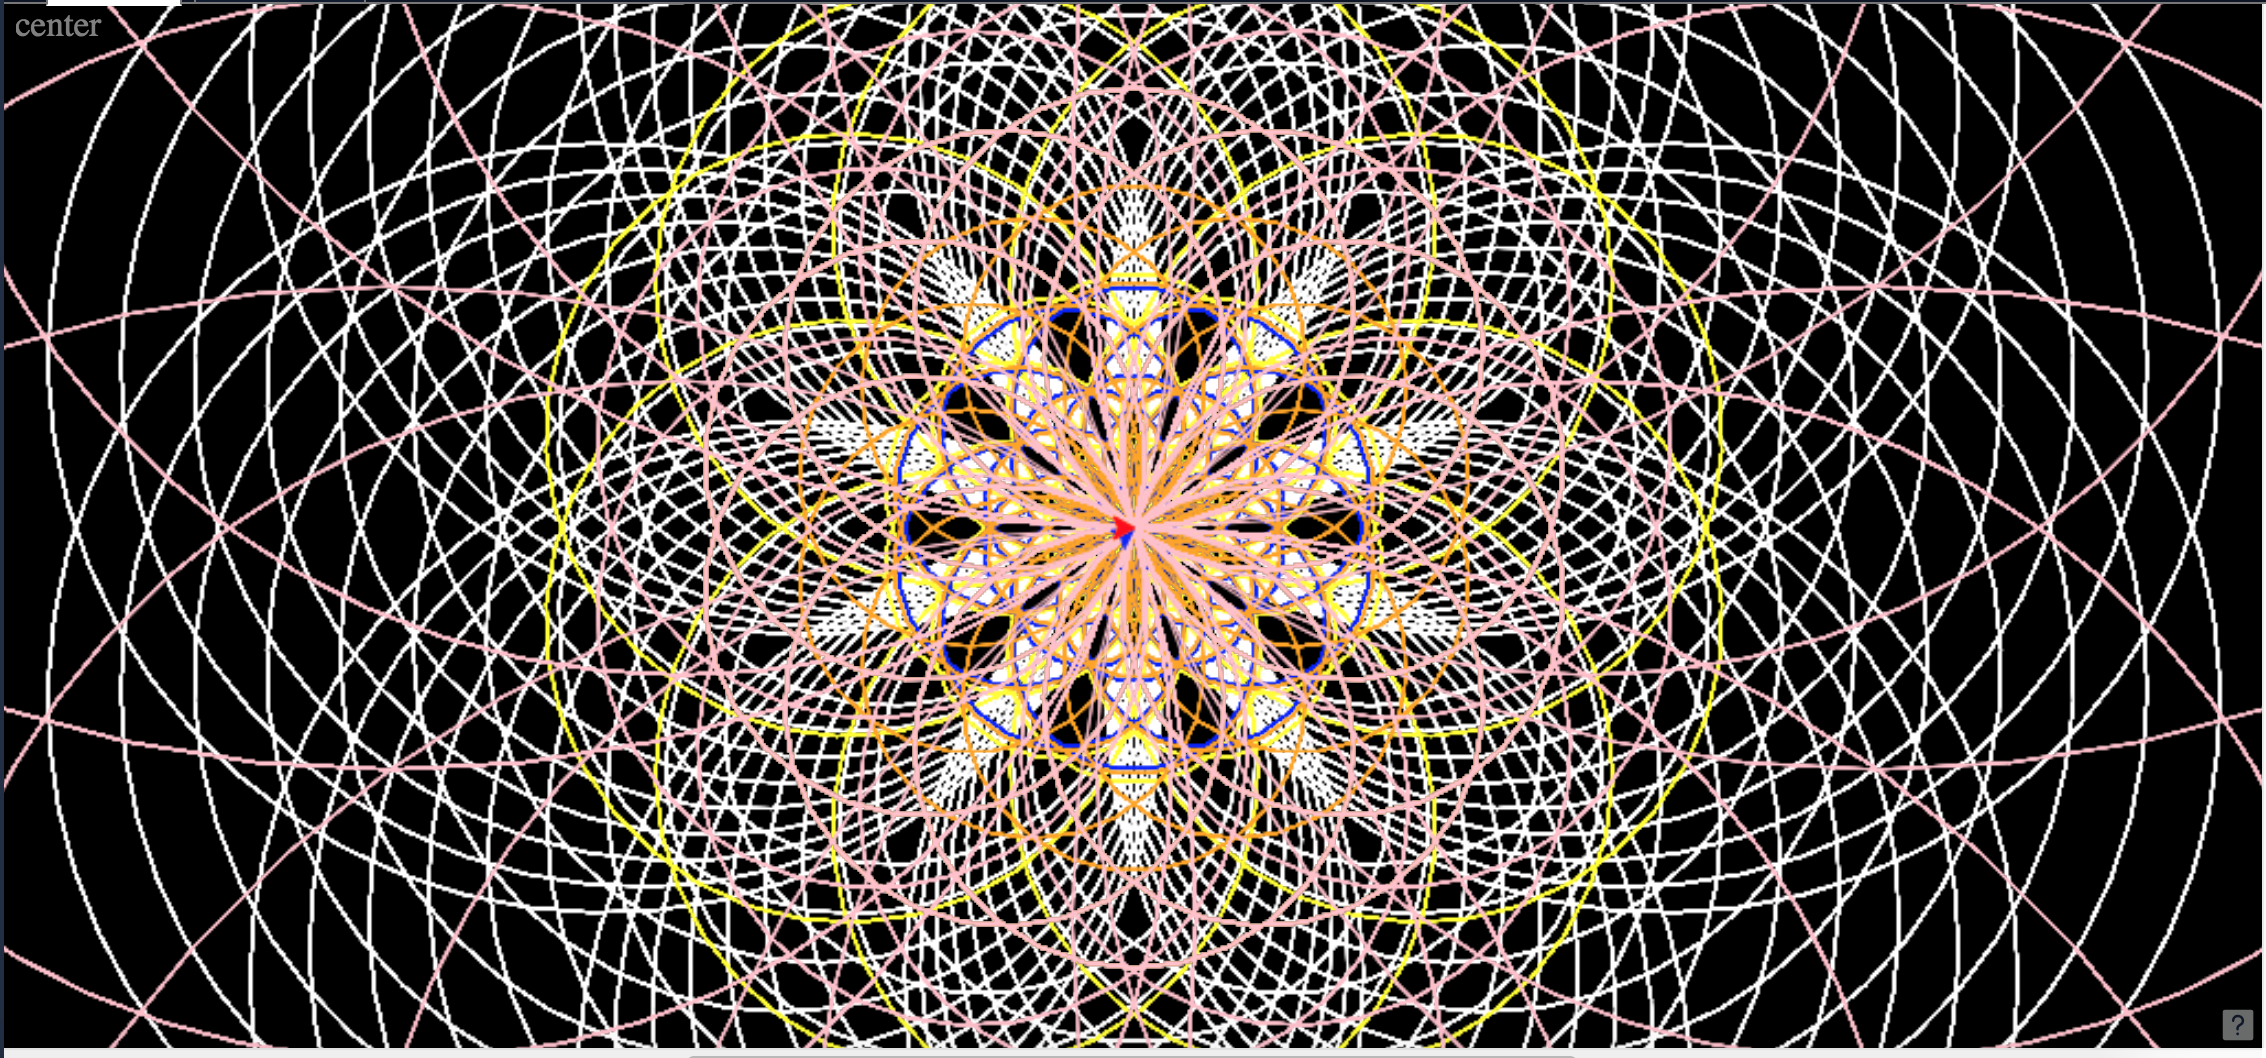 Repl it - Colorful Circle Spiral Generator Using Python Turtle